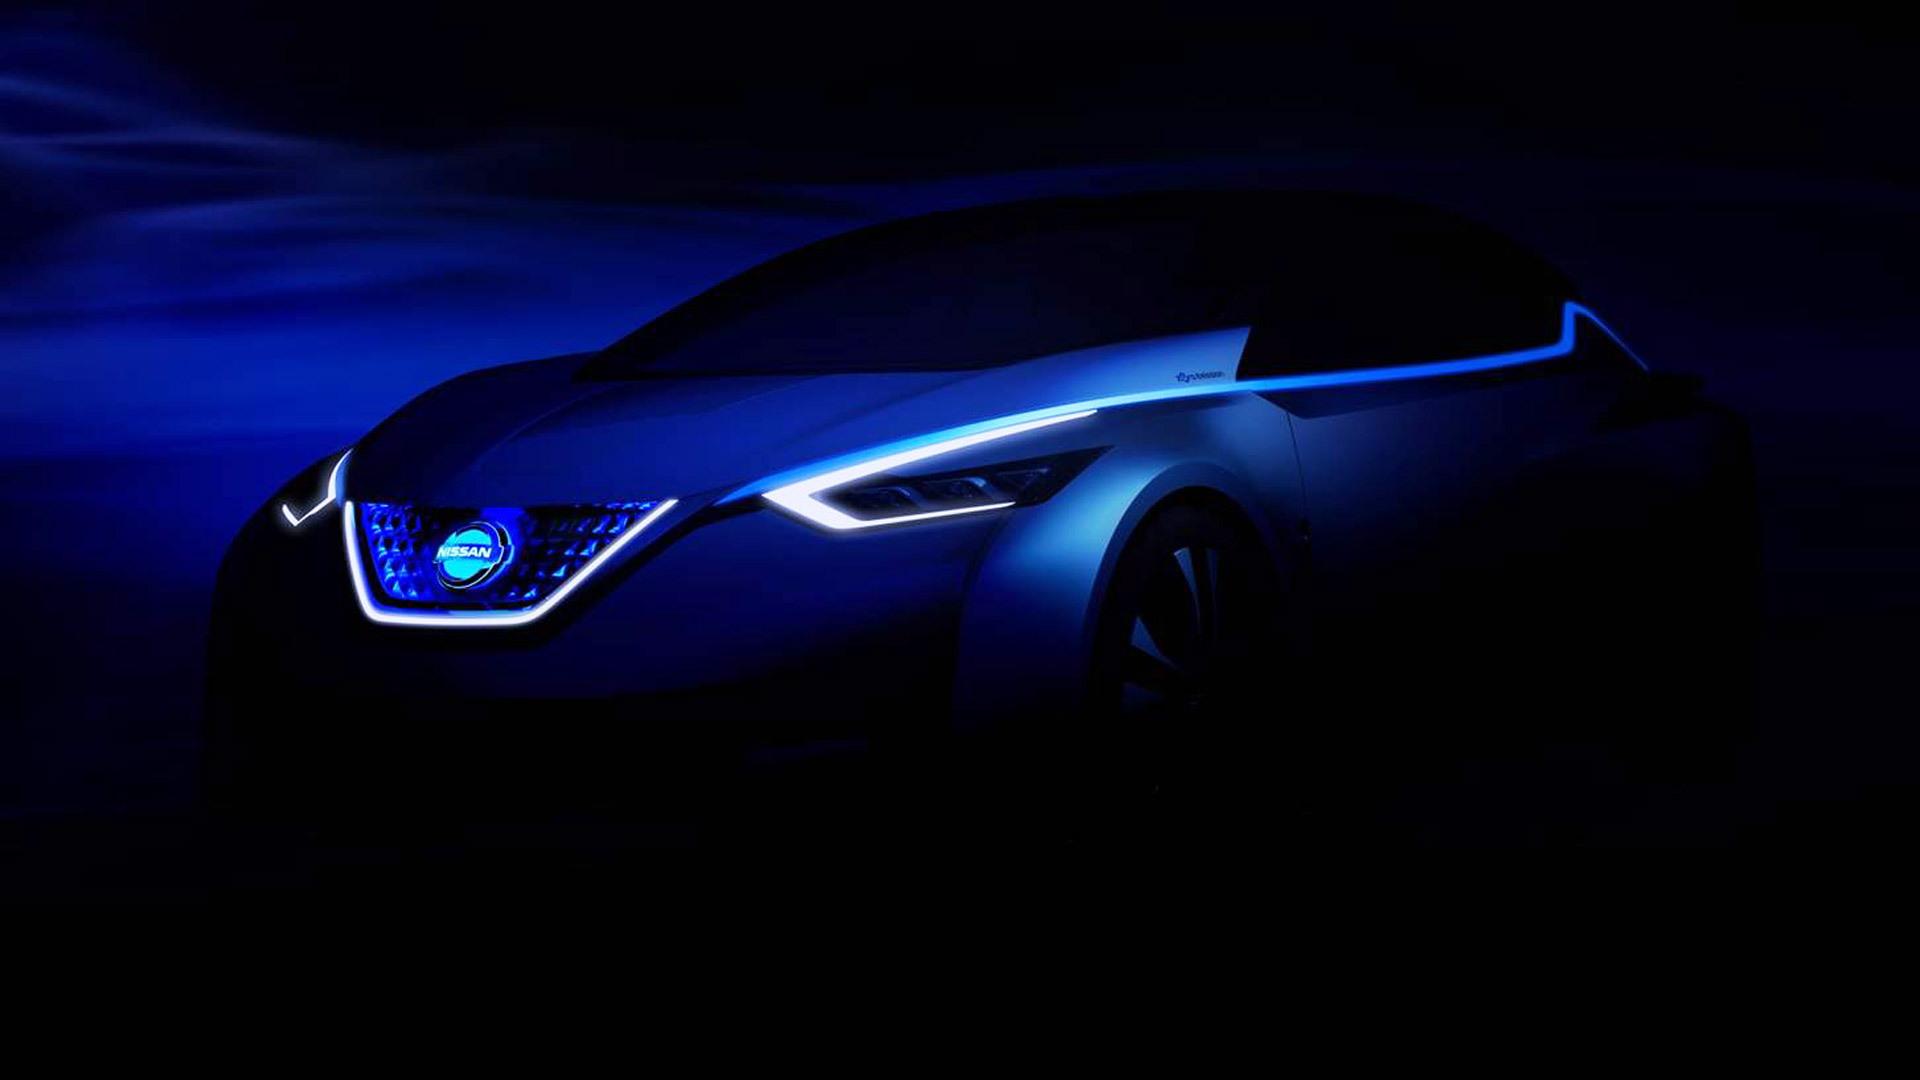 Nissan electric car concept debuting at 2015 Tokyo Motor Show